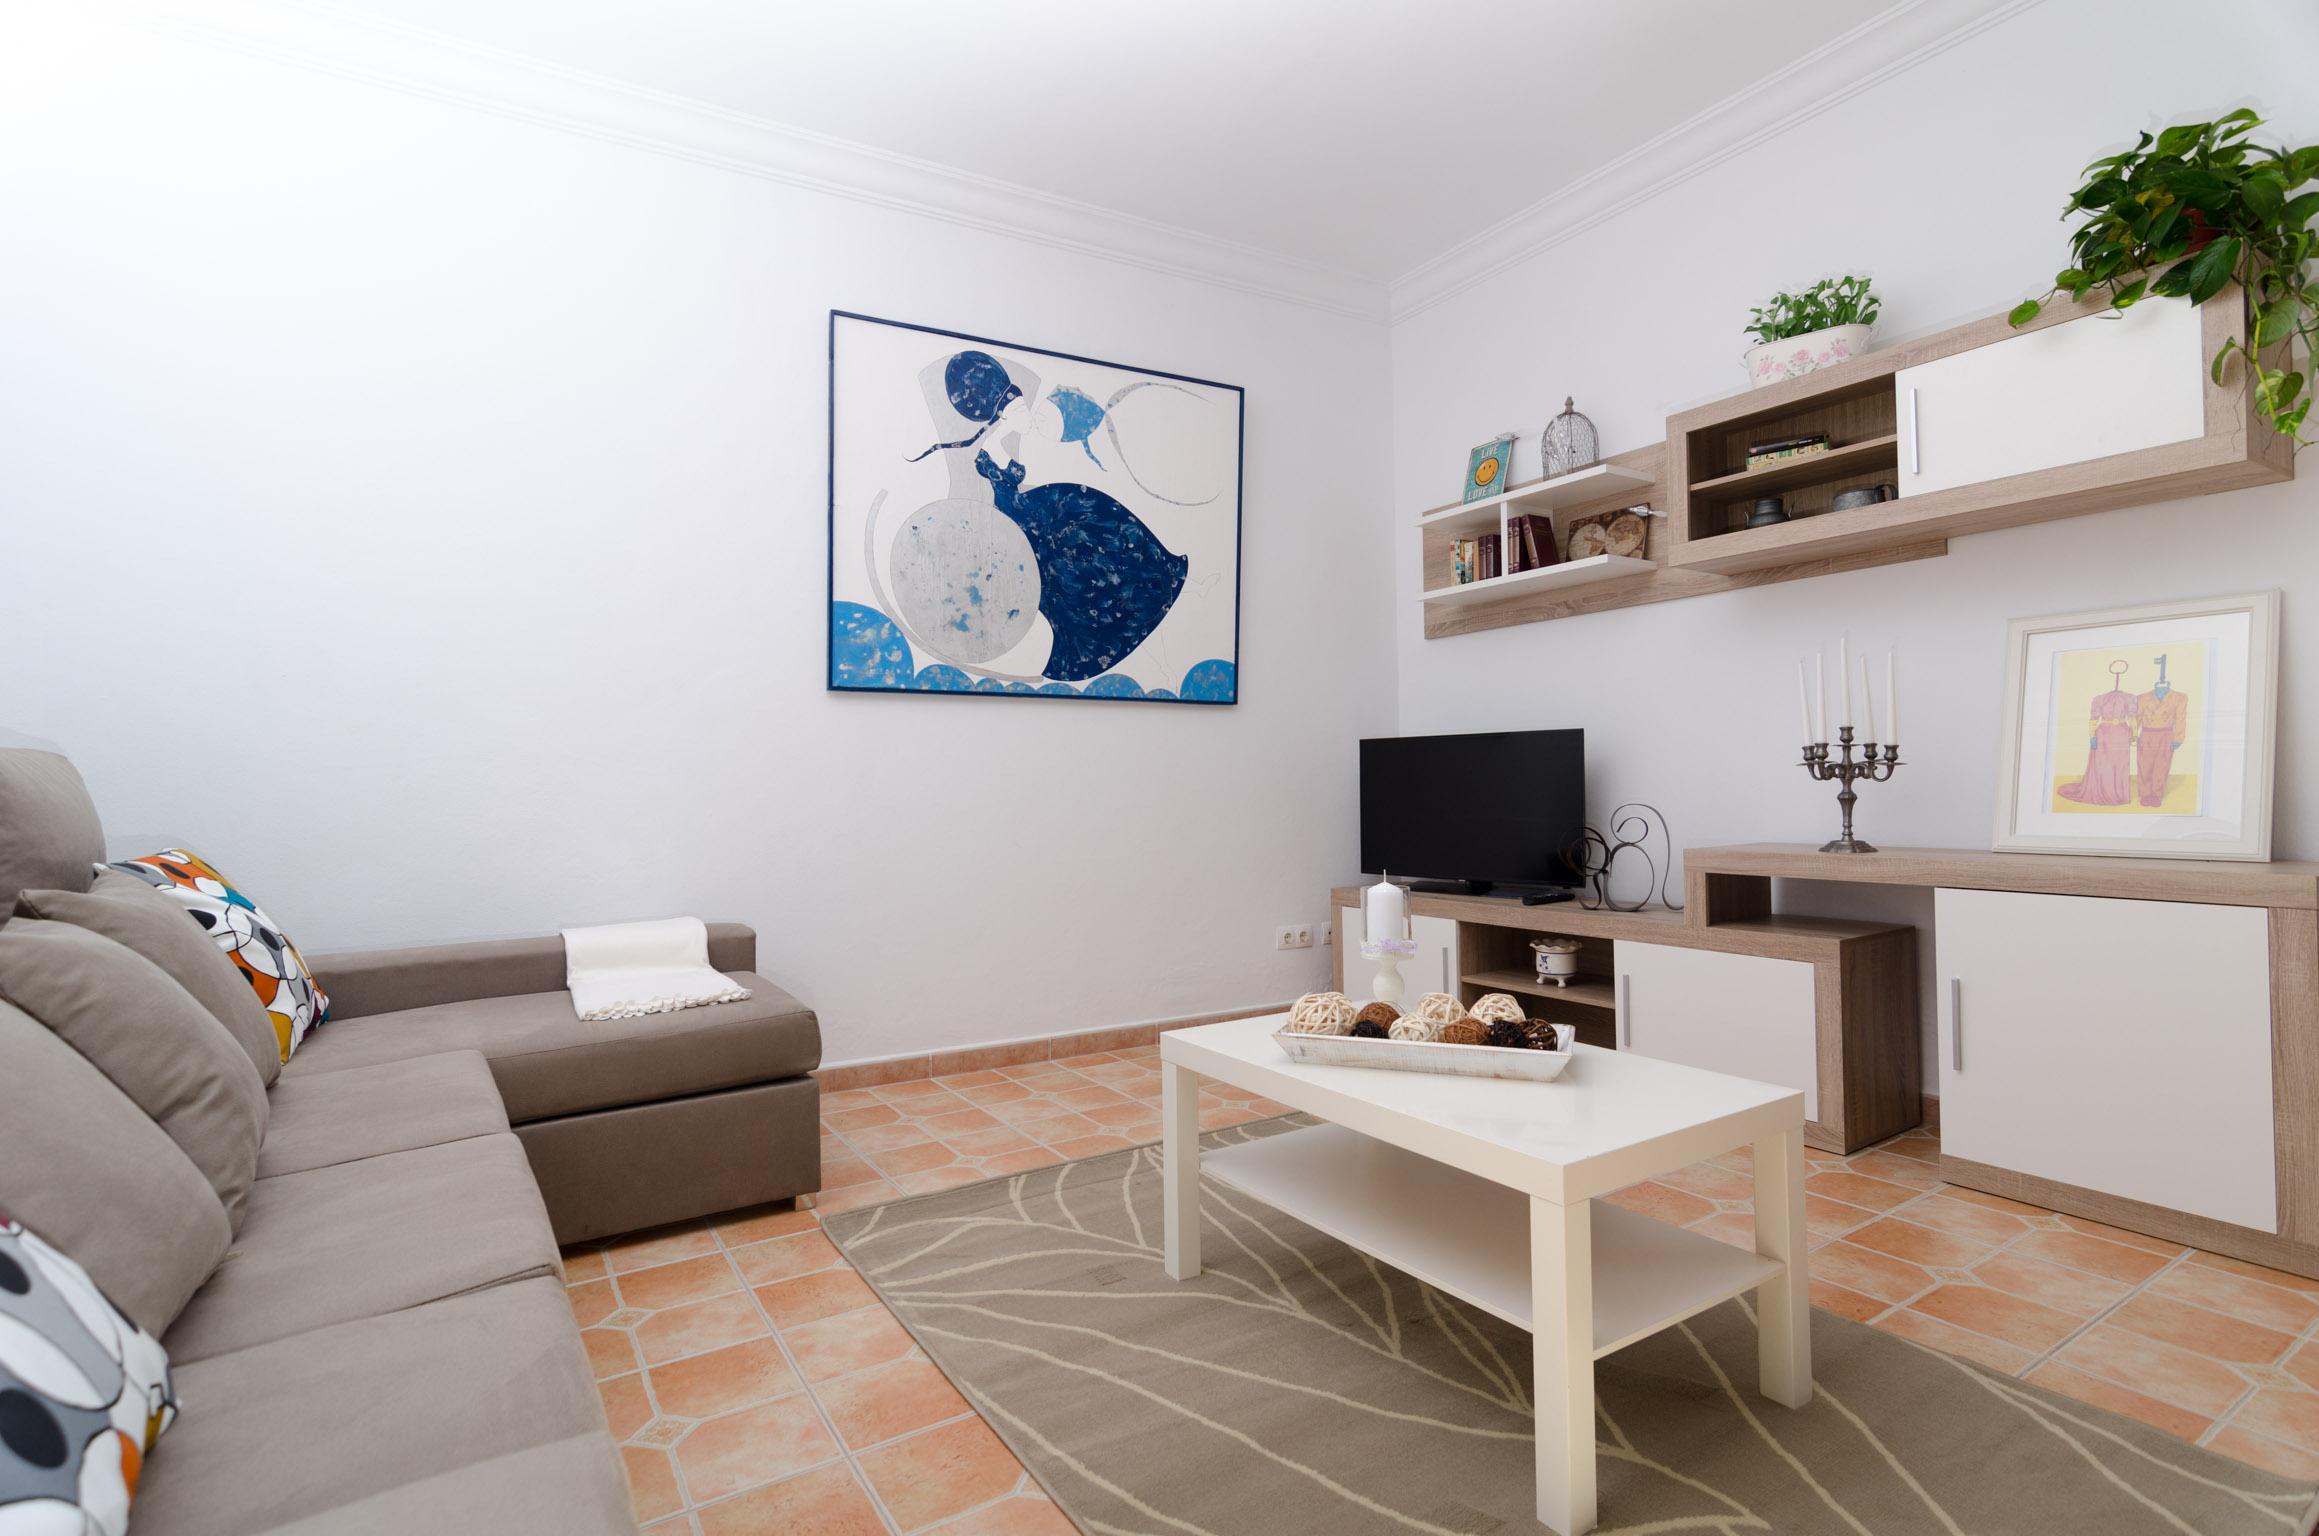 Ferienhaus SANT BLAI VELL (2284789), Campos, Mallorca, Balearische Inseln, Spanien, Bild 13